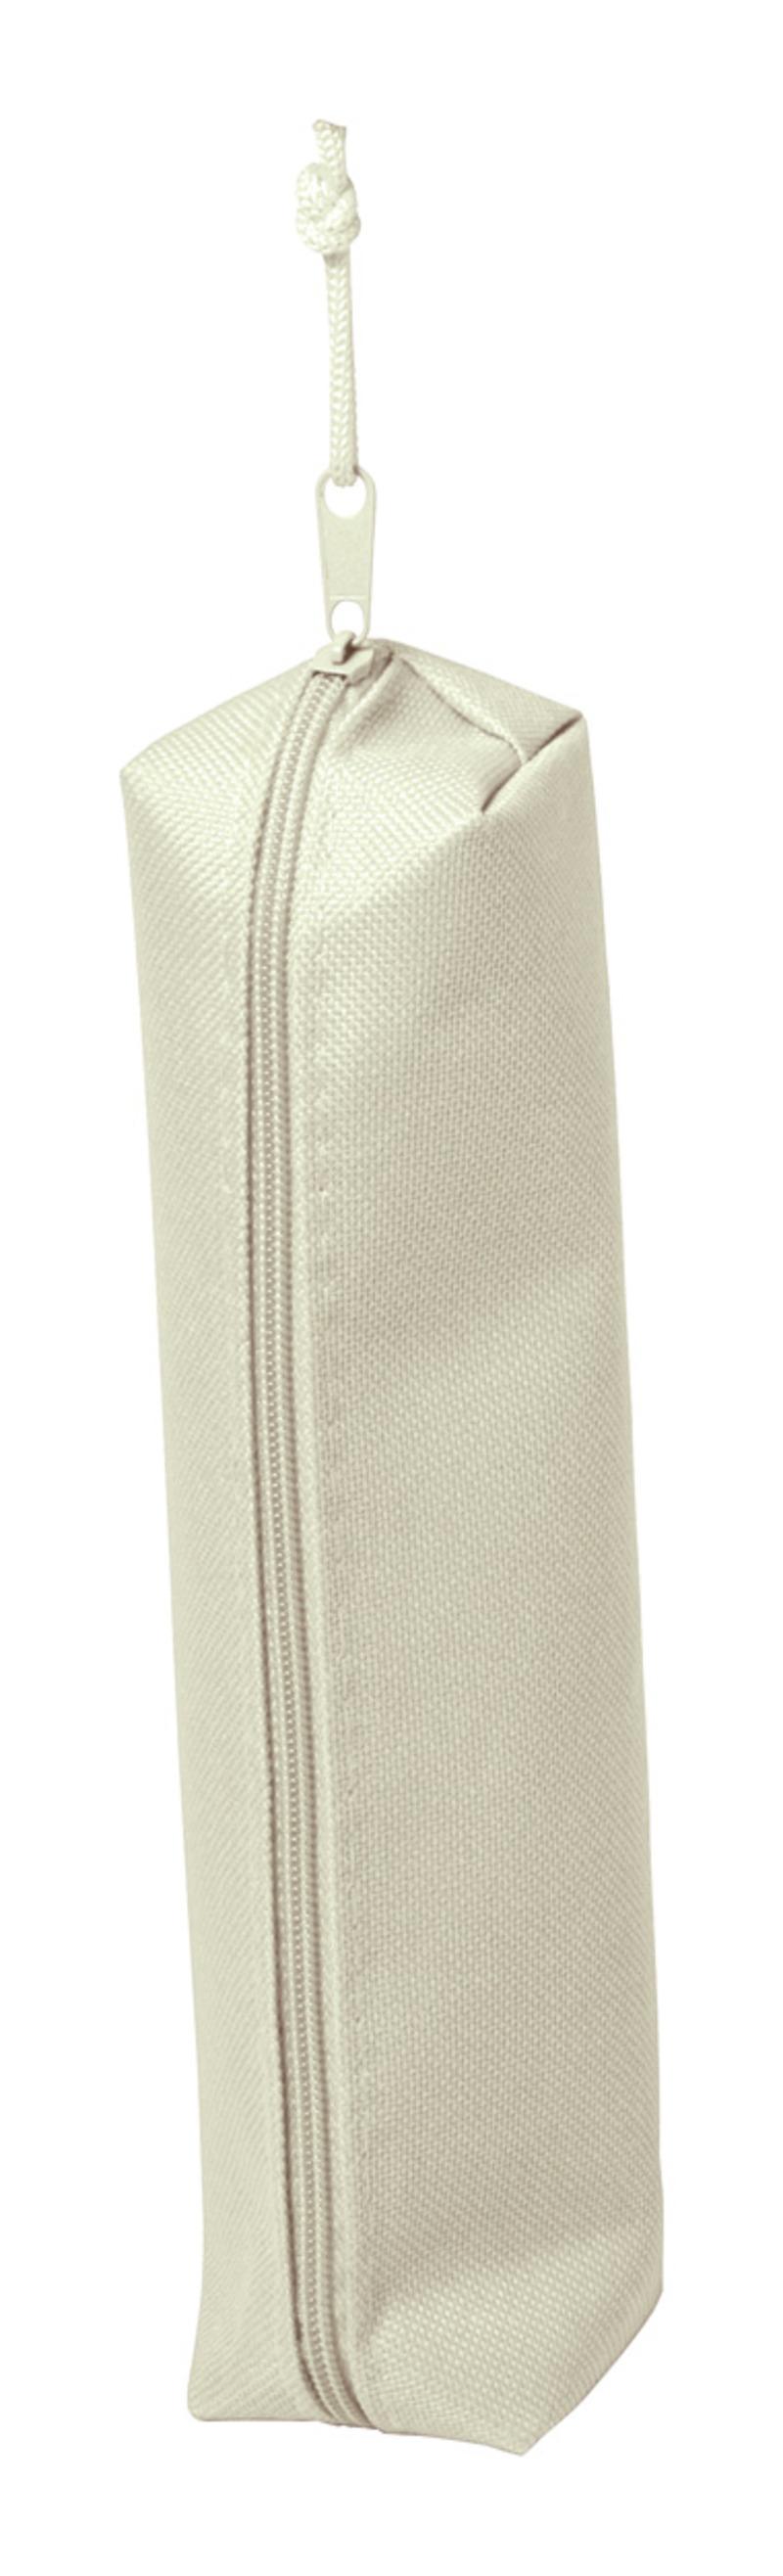 Atecax pencil case